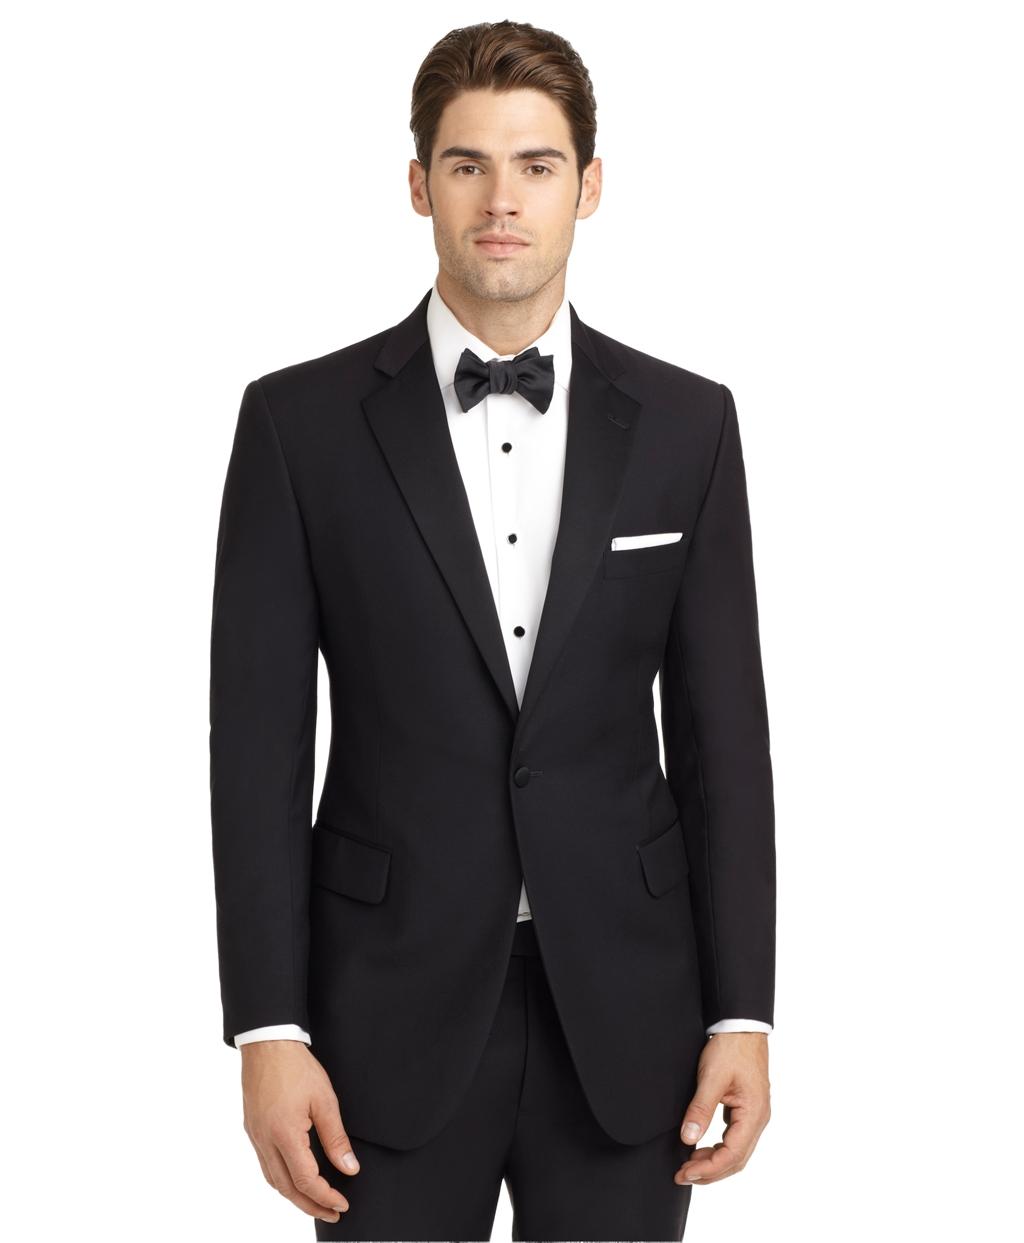 Tuxedo: Brooks Brothers Ready-made Regent Fit Tuxedo Jacket In